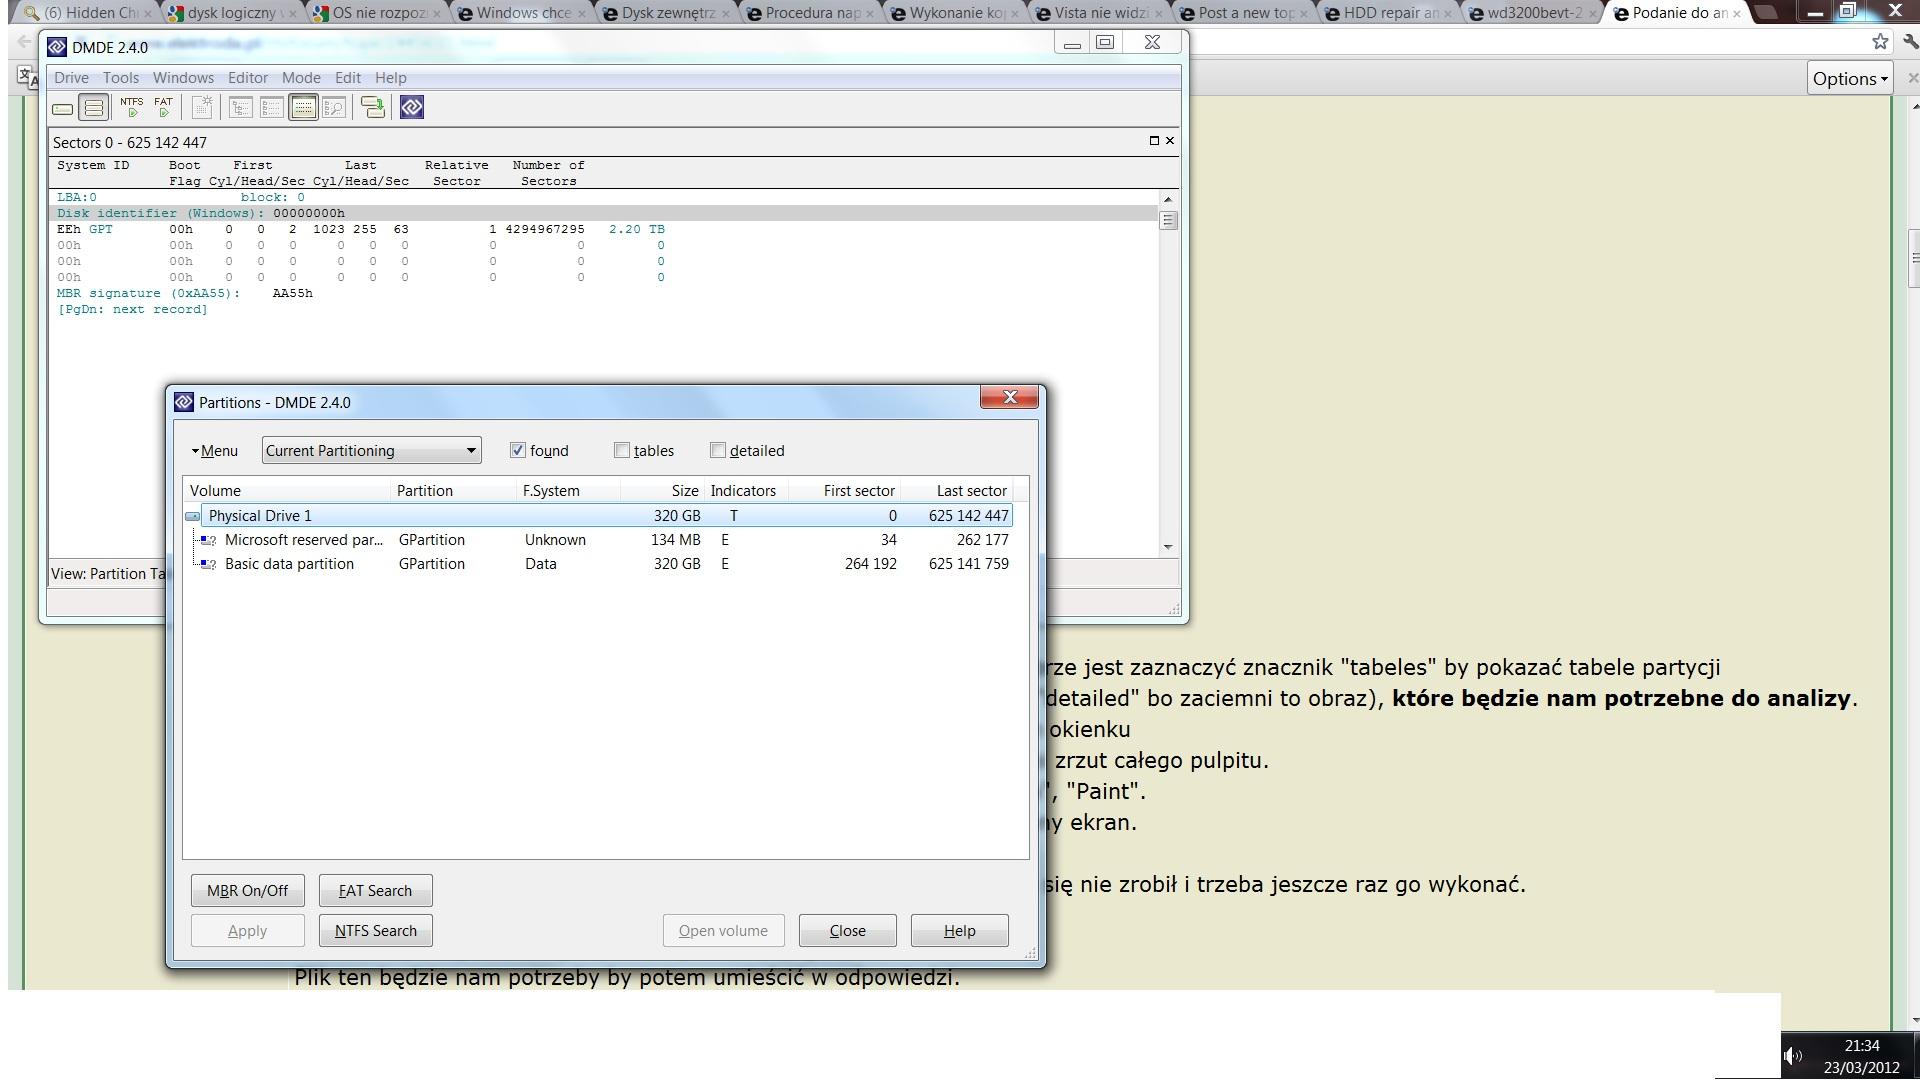 Dysk SATA WD3200BEVT - Windows 7 chce go formatowa�